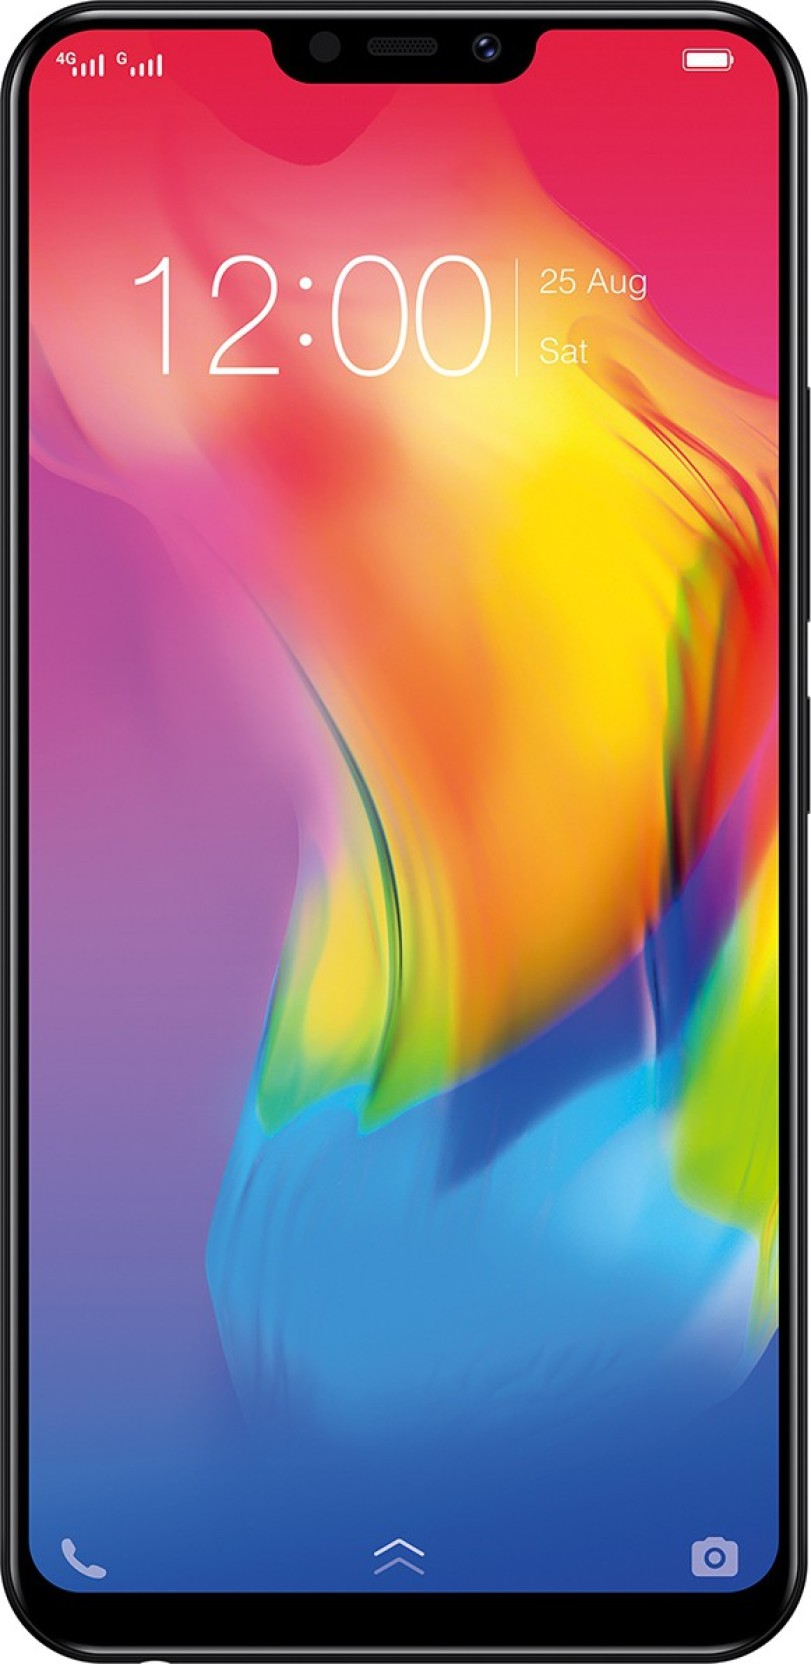 Vivo Y83 Pro Black 64 Gb Online At Best Price Only On Speaker Bluetooth Original V9 Special  Opening Offer